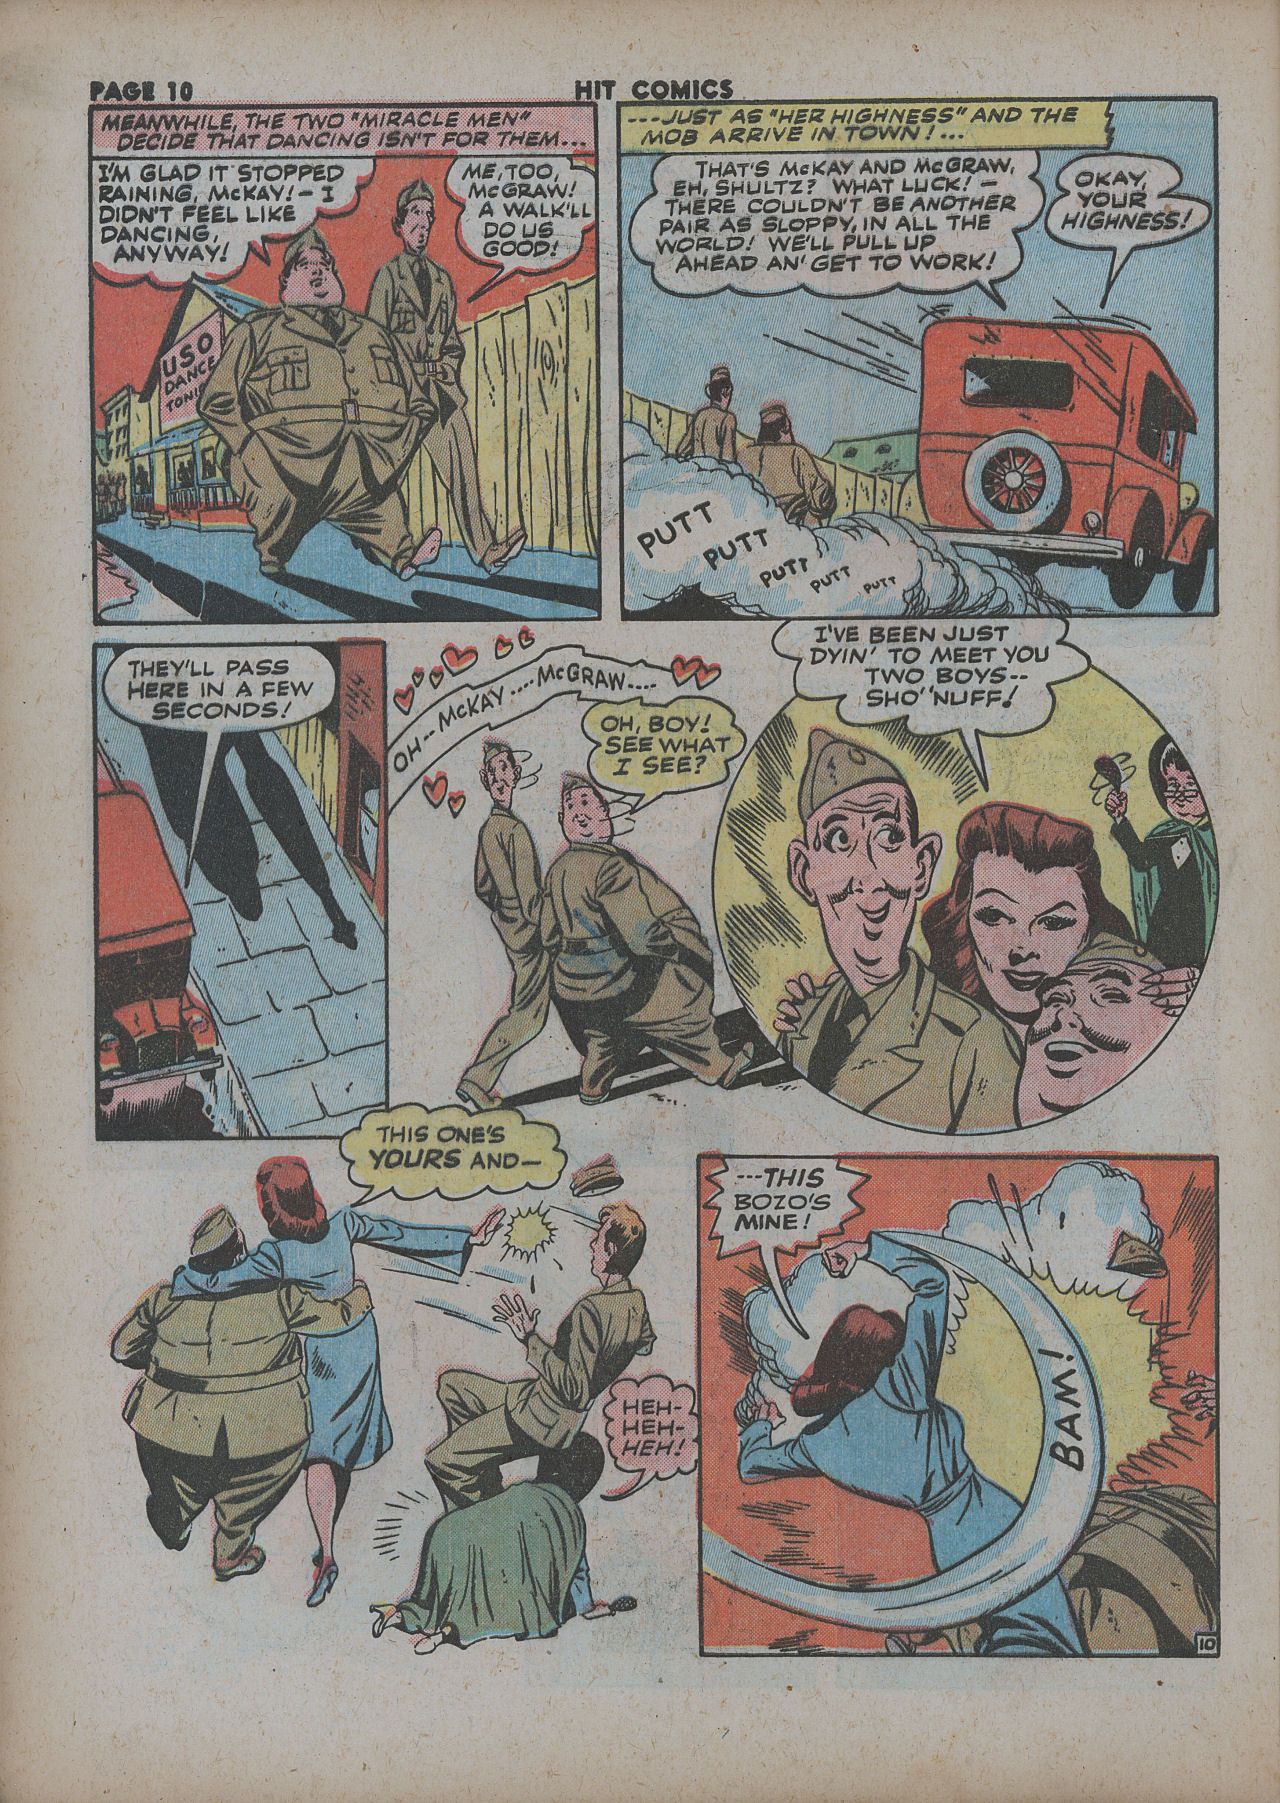 Read online Hit Comics comic -  Issue #27 - 12